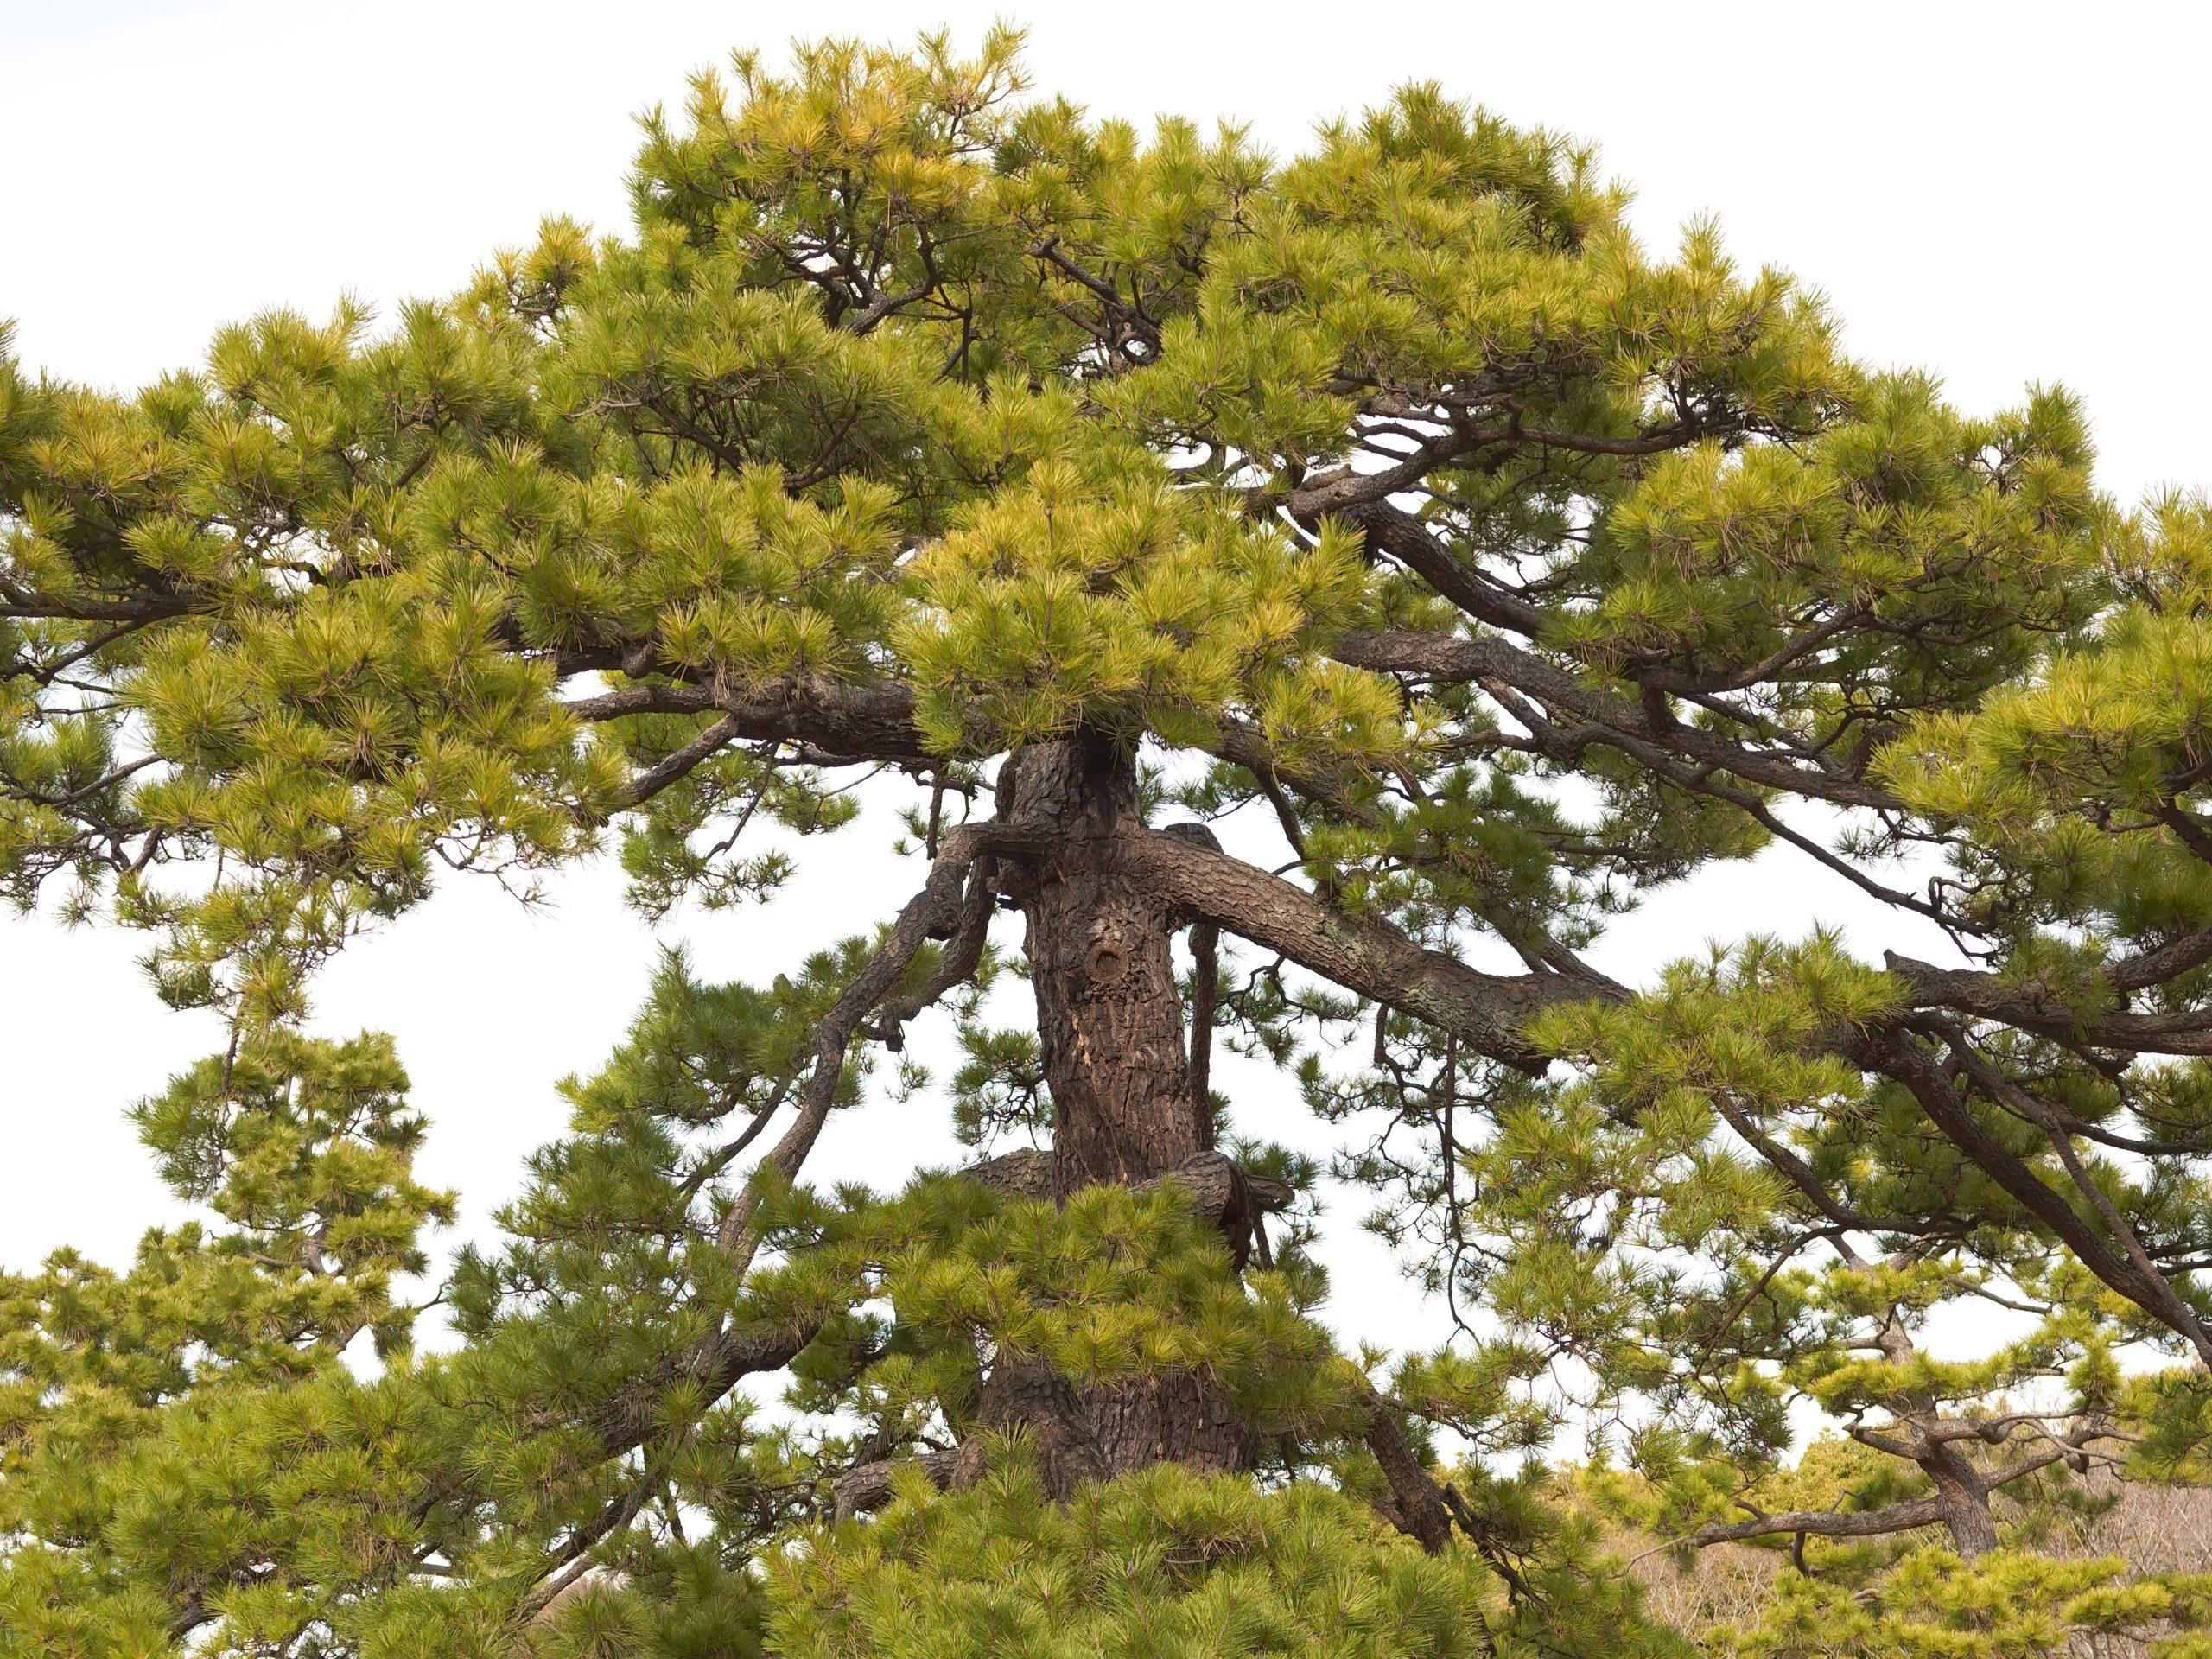 【SIGMA】『fp』と行く代々木公園